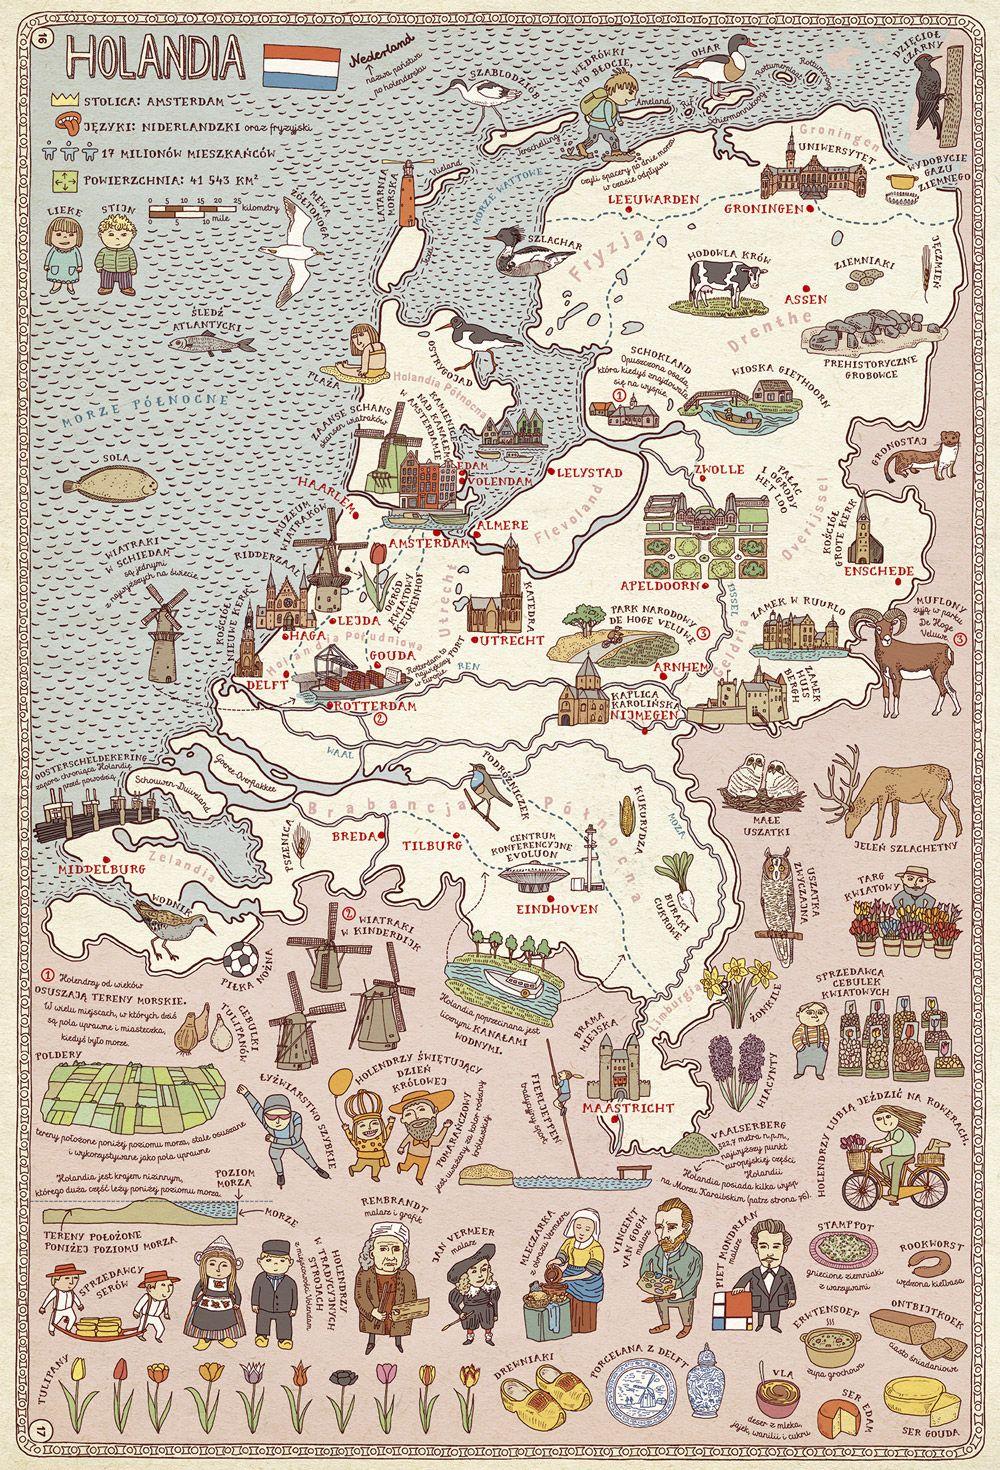 Kaart nederlandg 10001470 pinterest kaart nederlandg 10001470 gumiabroncs Image collections